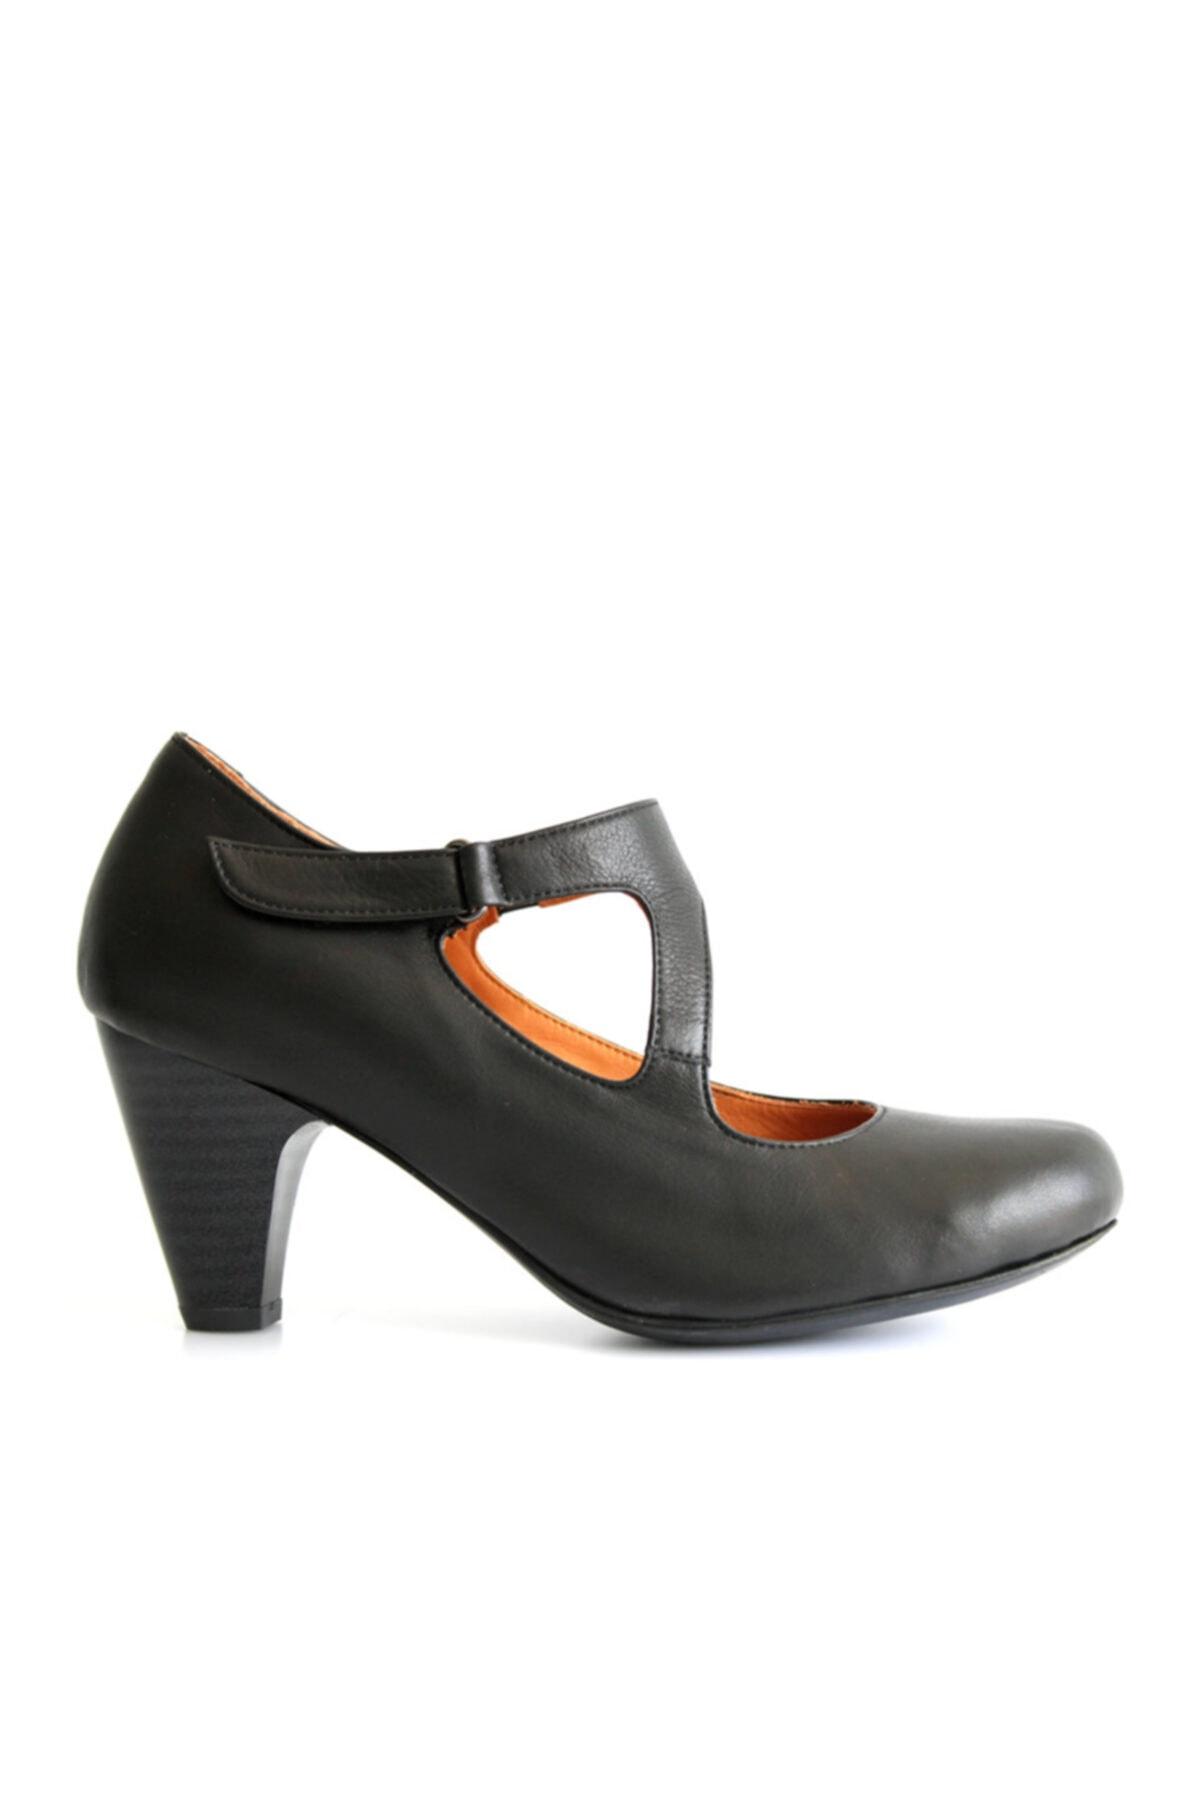 Beta Shoes Kadın Siyah Ayakkabı 2